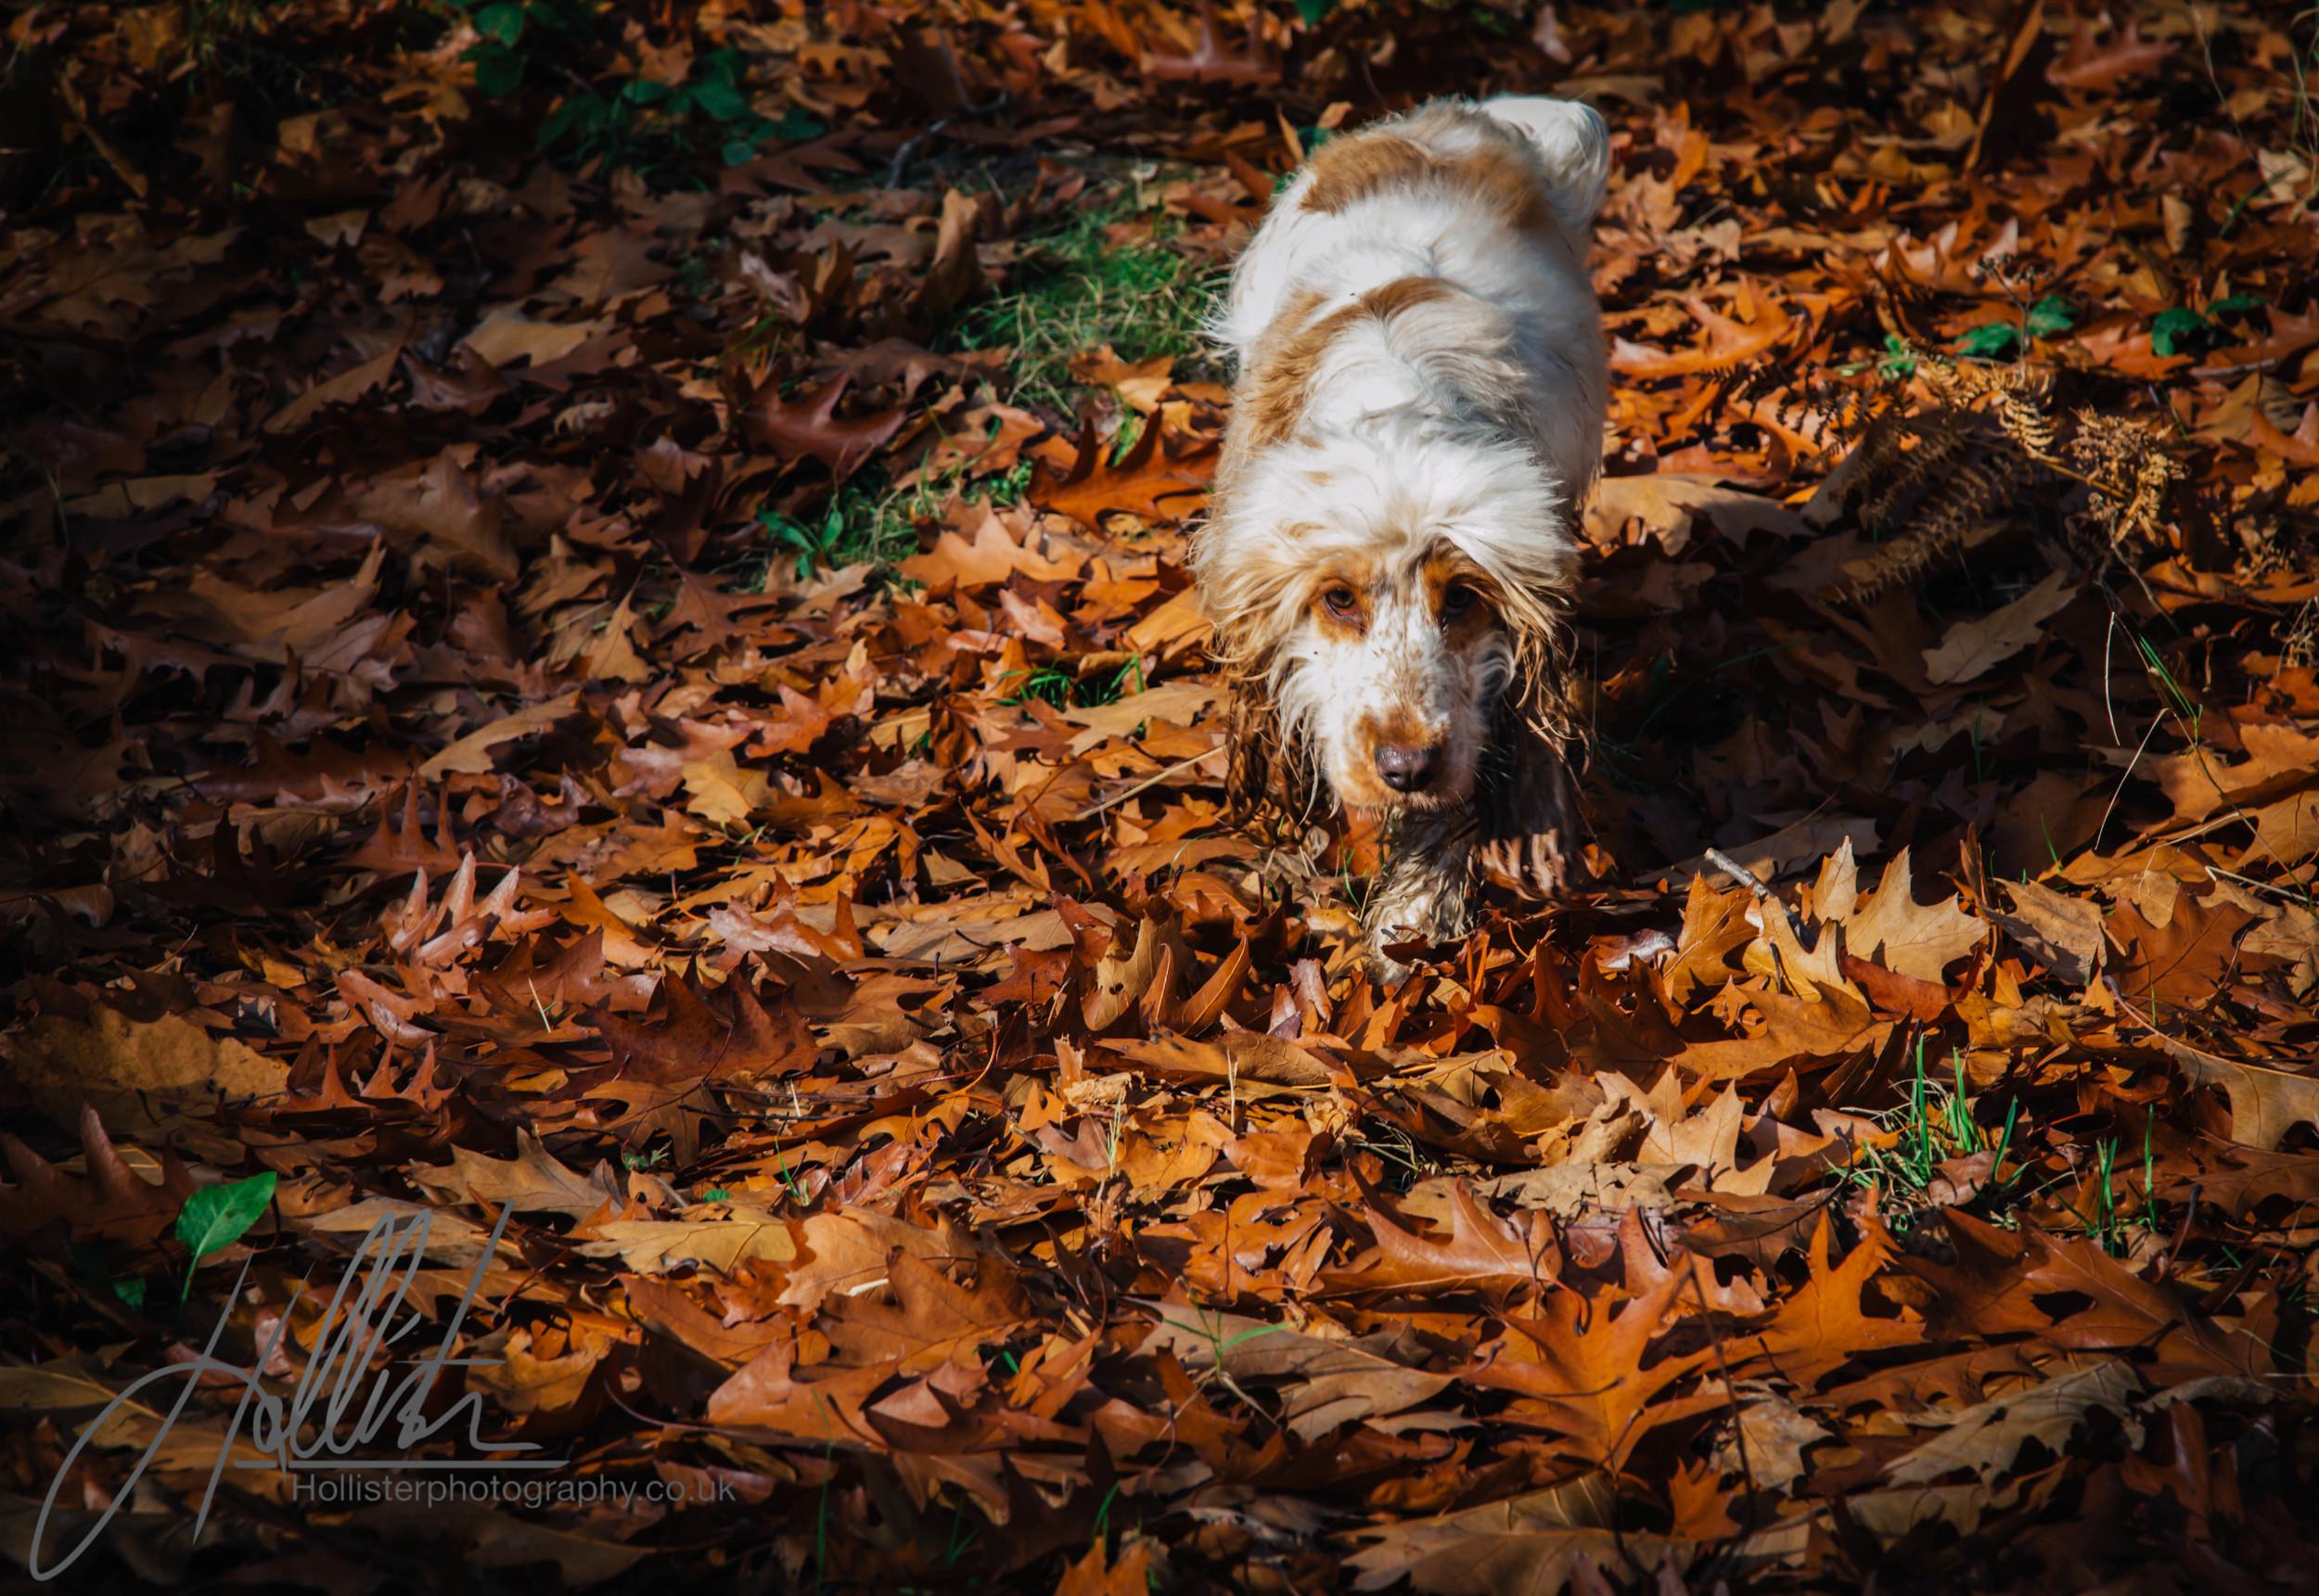 Hollisterphotography ABBY CLOWES WOOD DOG WALK-66.JPG